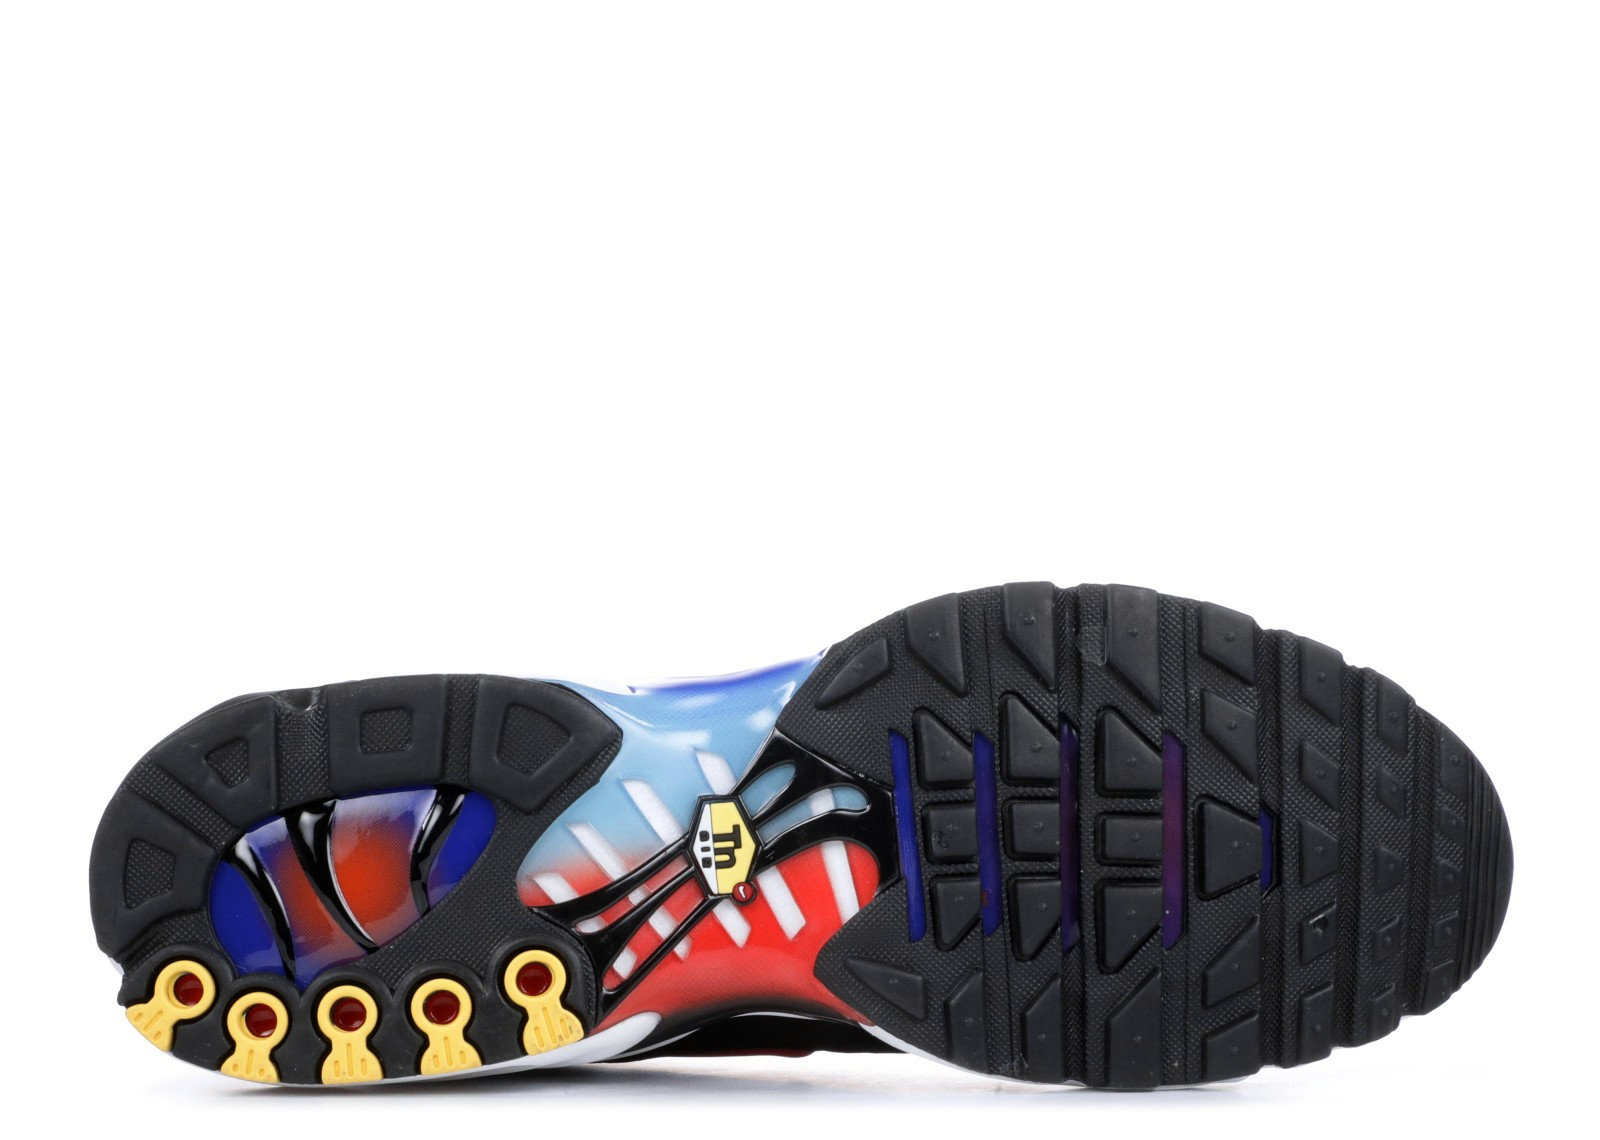 Nike Air Max Plus Tn Greedy Orange Blue Av7021 001 Sepsale